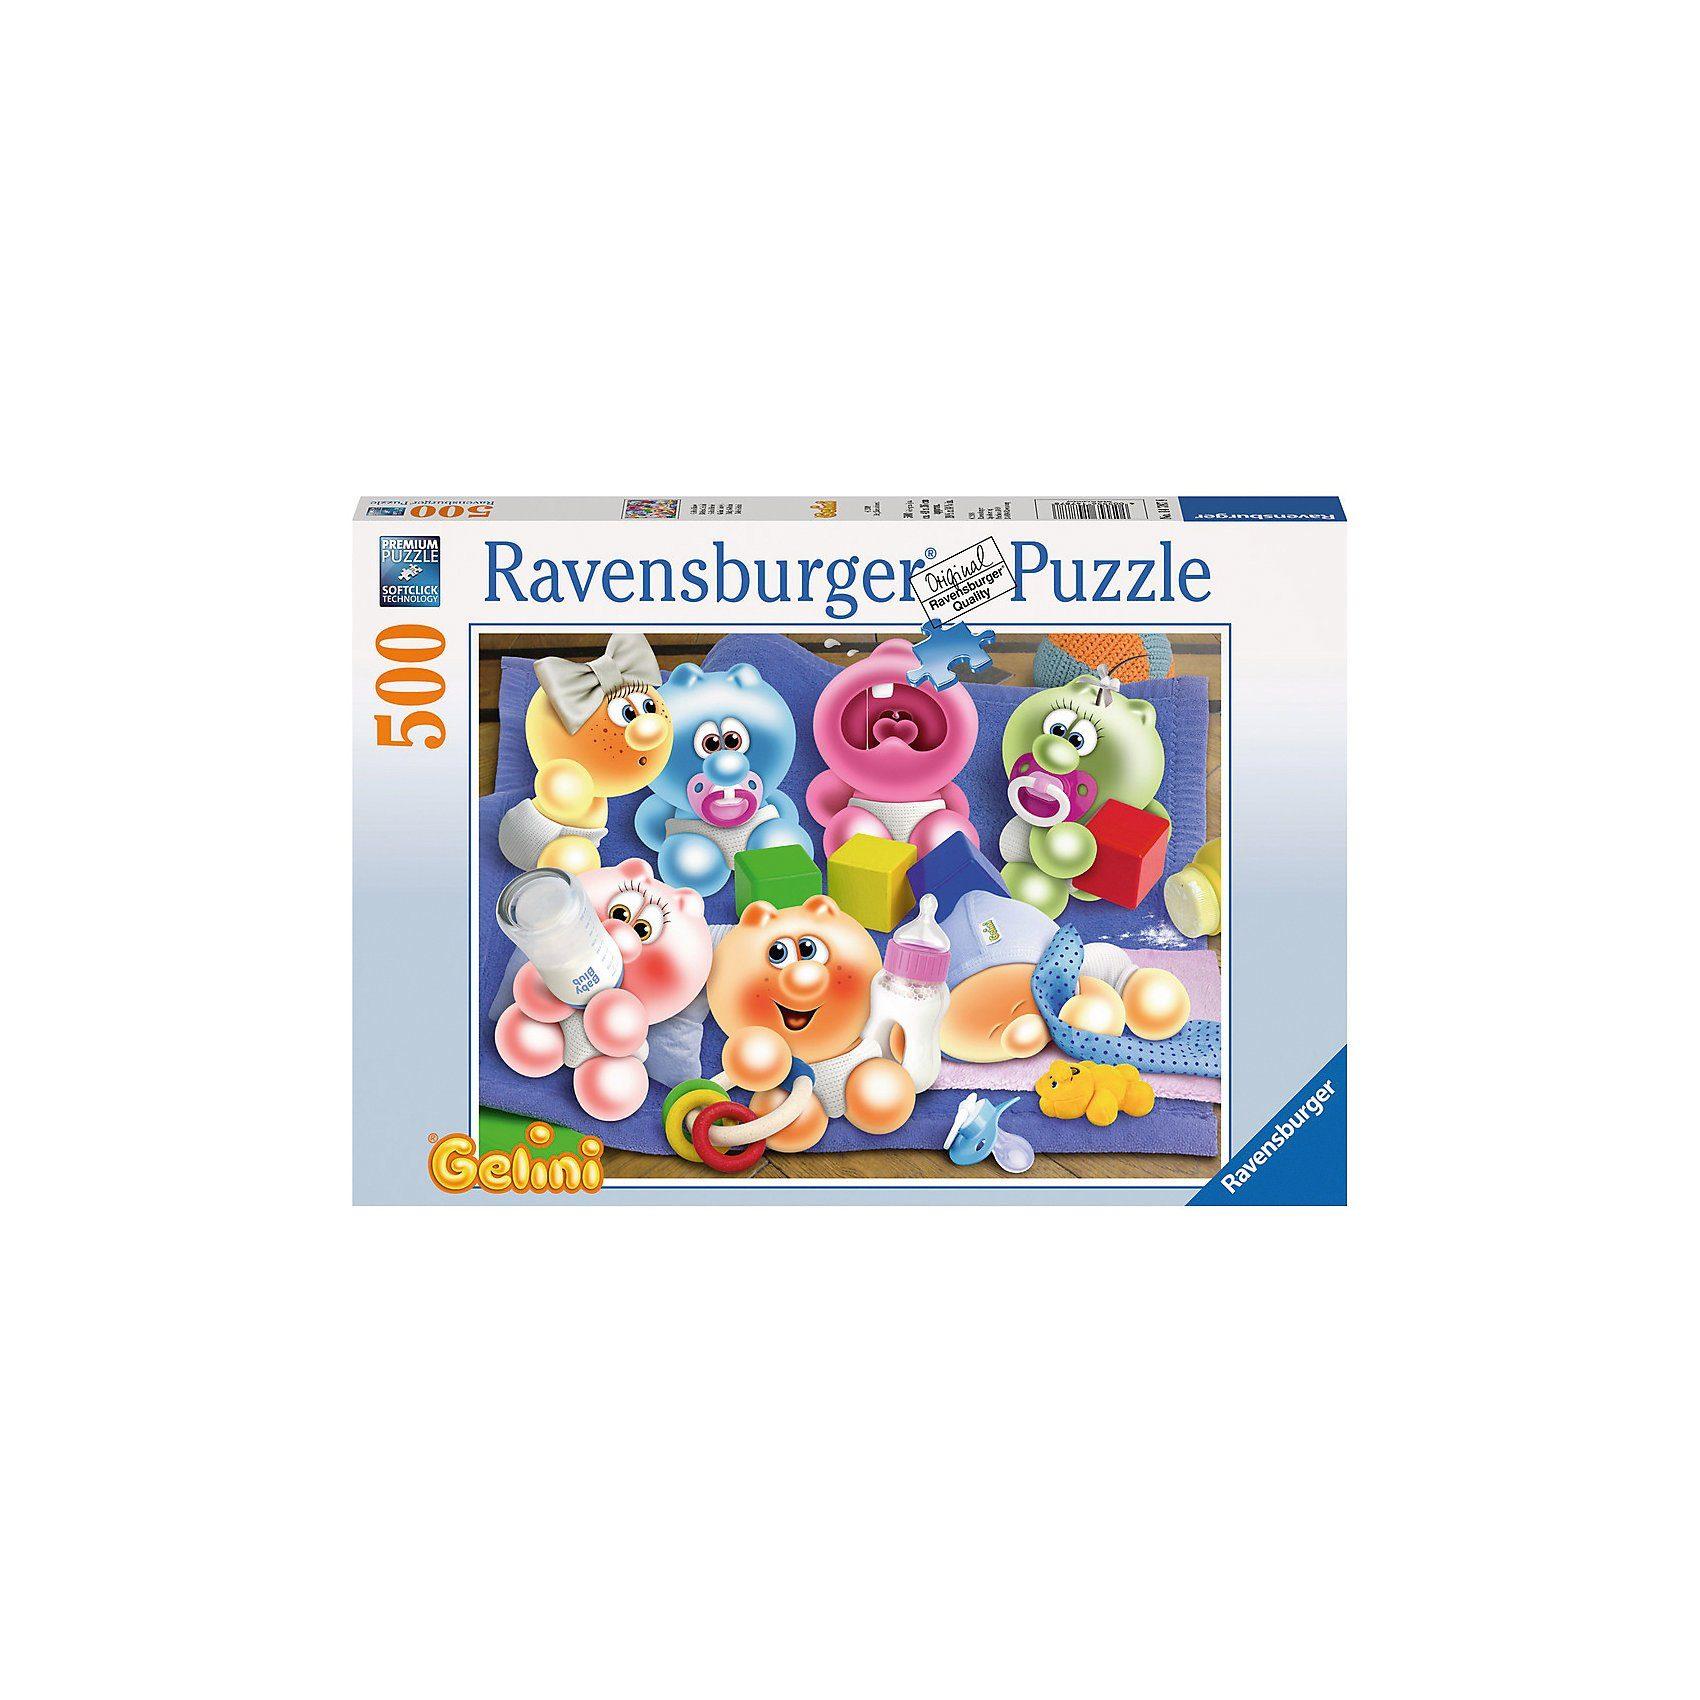 Ravensburger Puzzle 500 Teile Gelini Baby